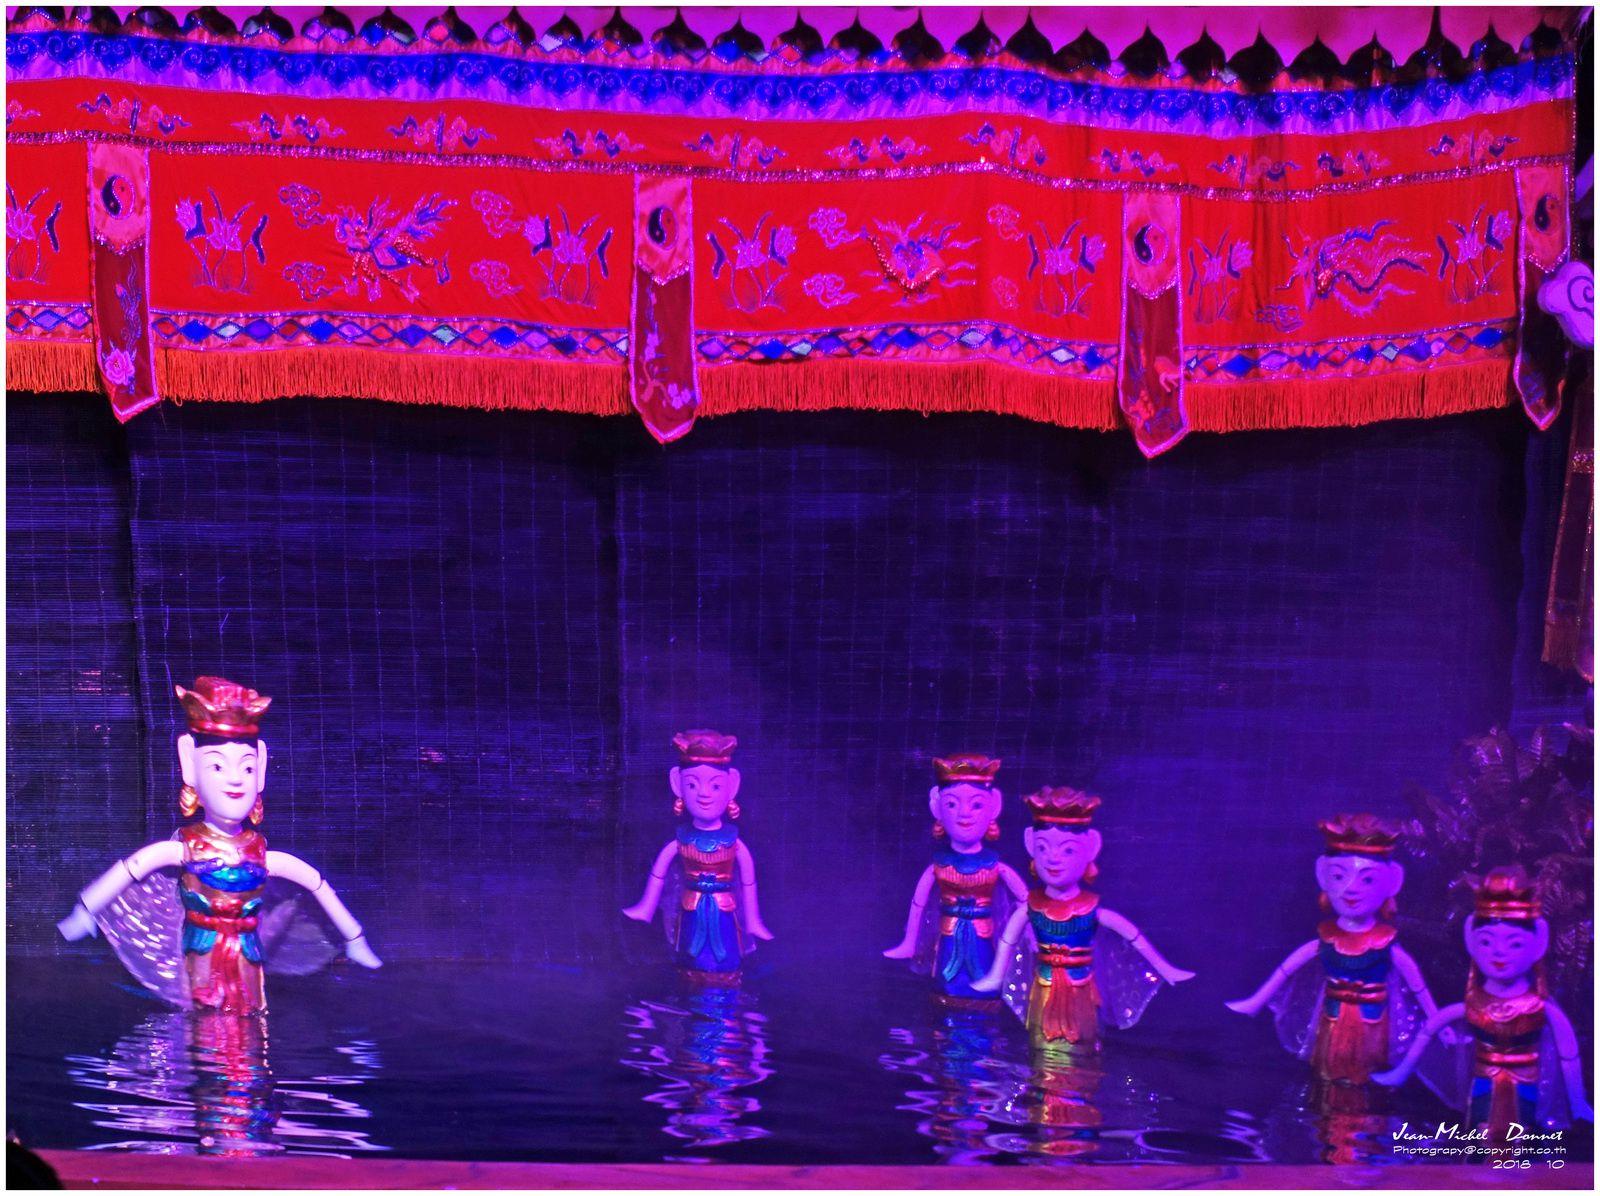 Spectacle de marionnettes aquatiques (Ha Long, Viêt Nam)